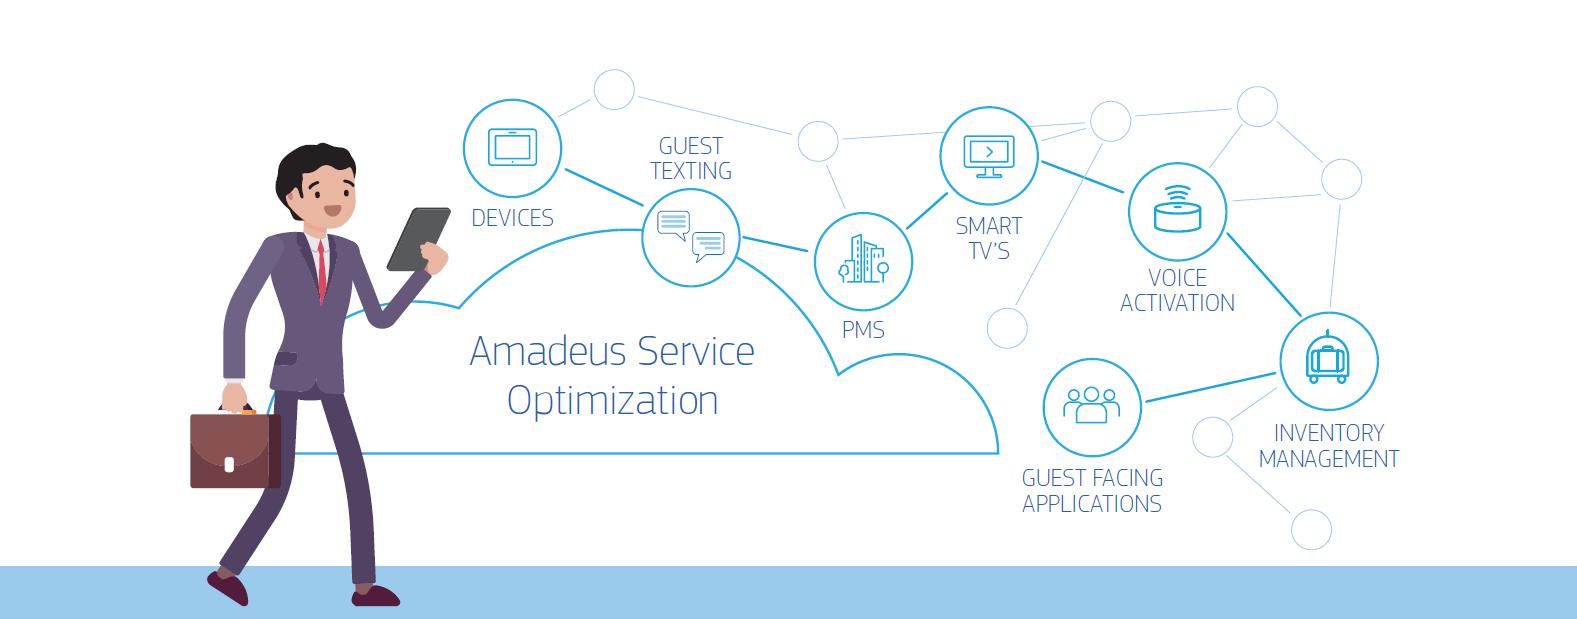 Amadeus Service Optimization